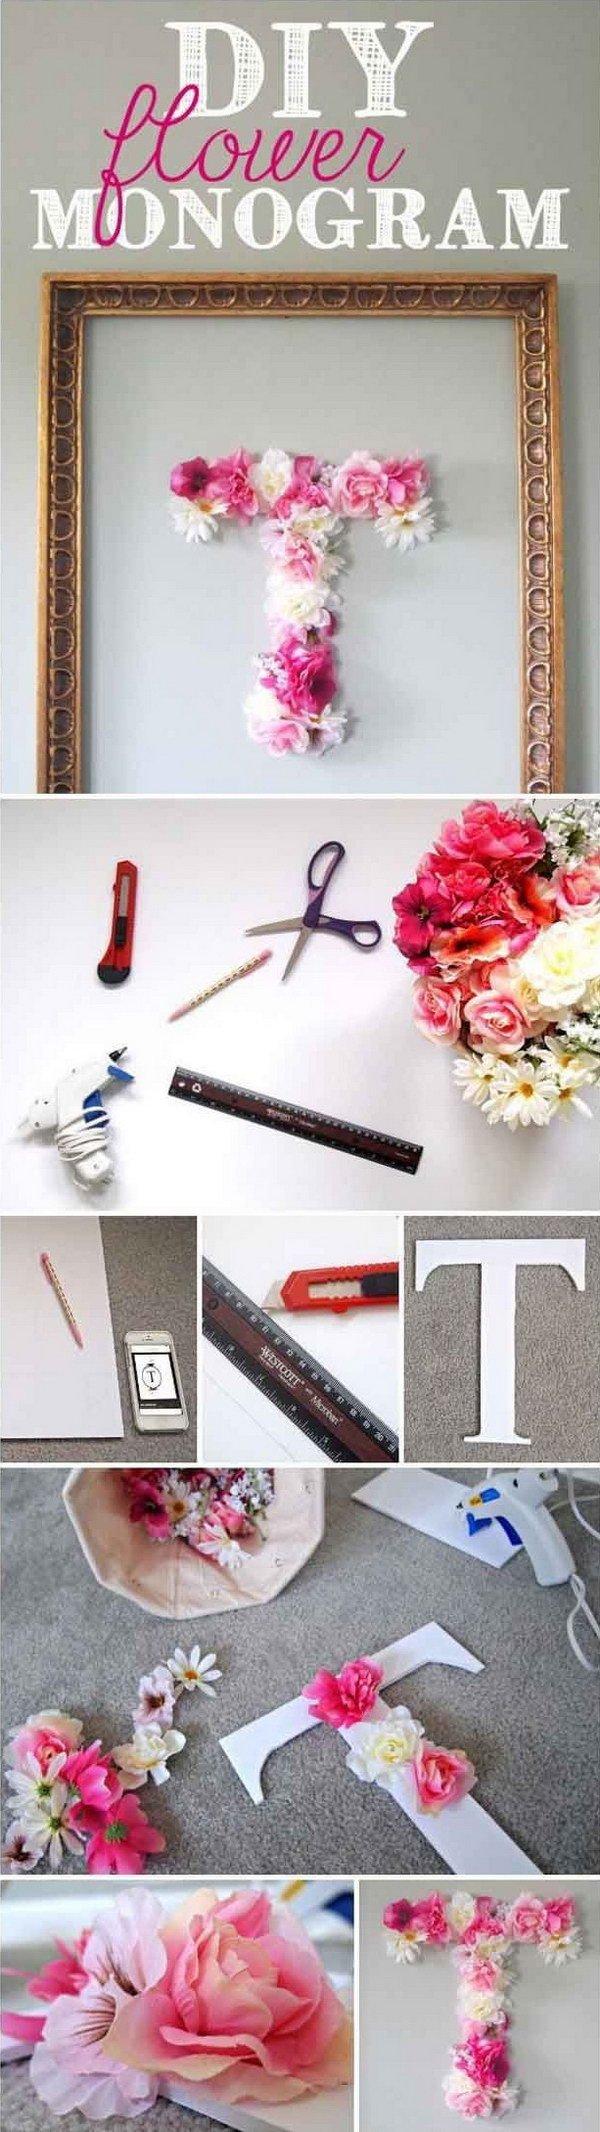 Room Decor Ideas for Teens New 25 Diy Ideas & Tutorials for Teenage Girl S Room Decoration 2017